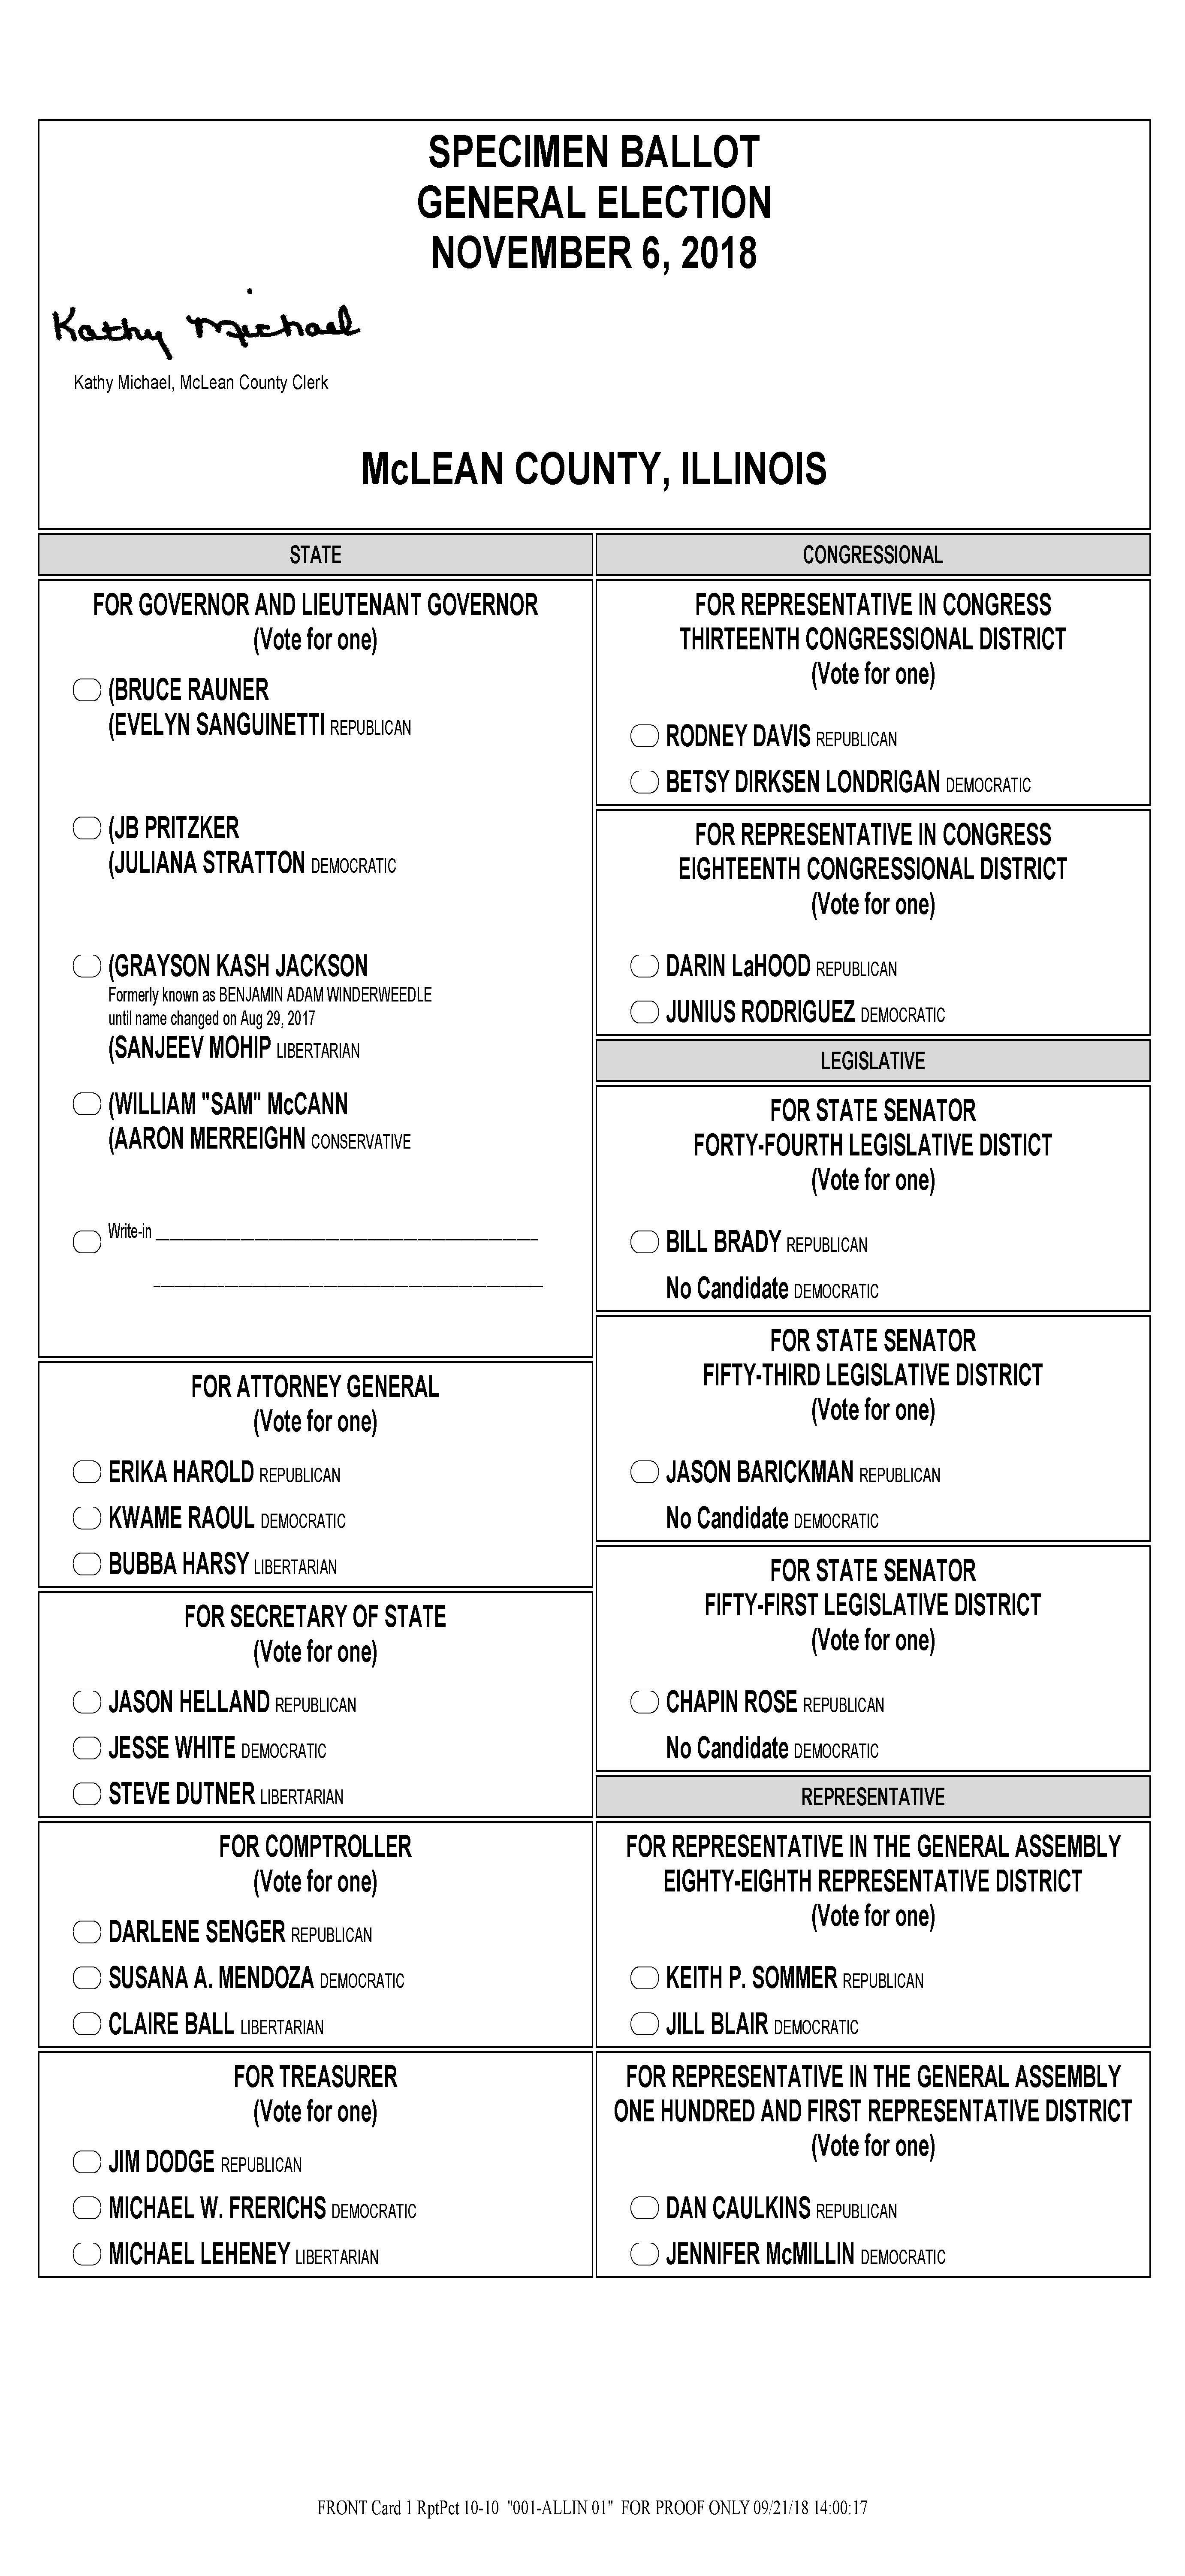 Election day arrives: polls open until 7 p. M. | wglt.